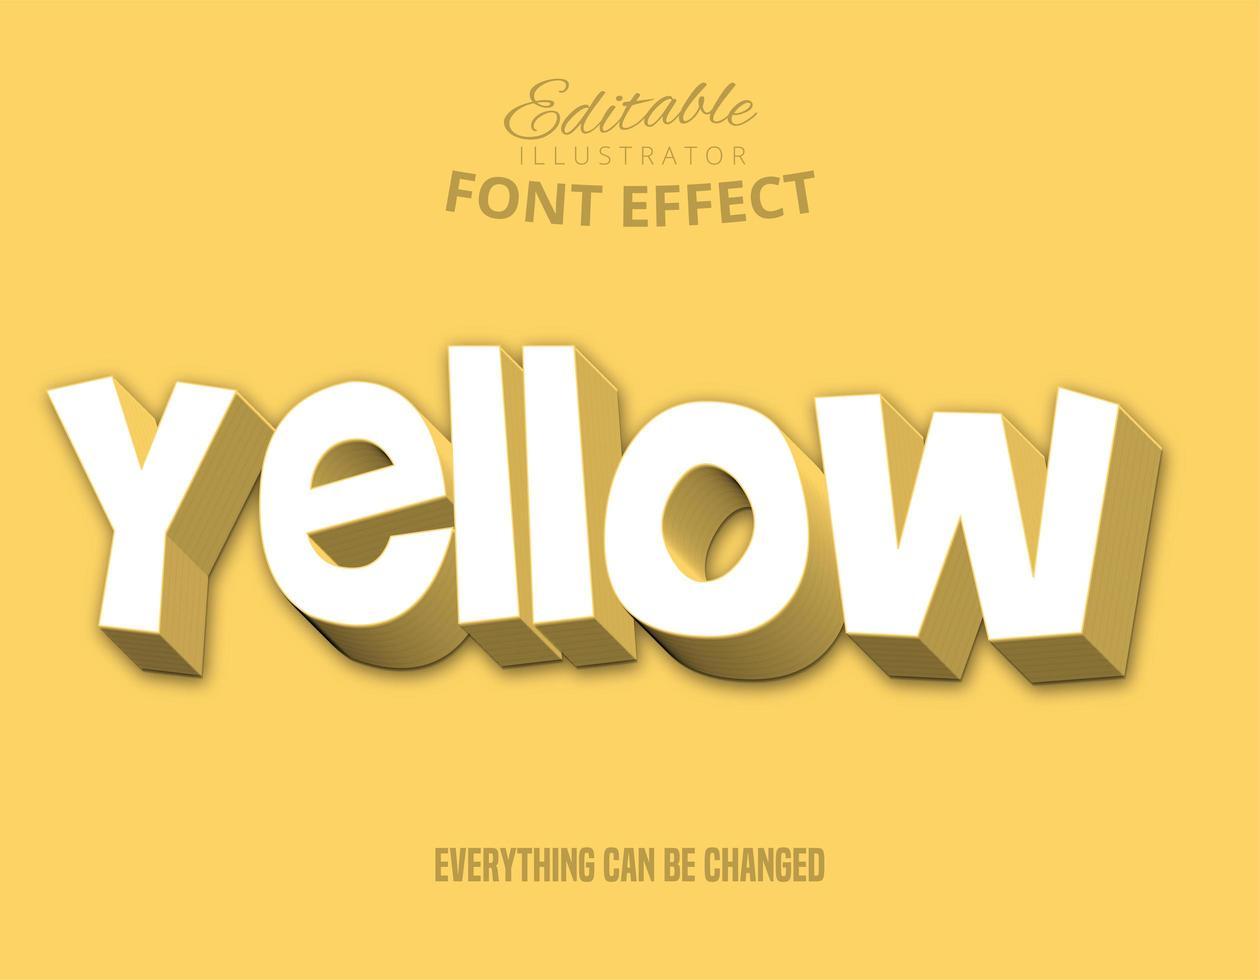 Texto escalonado amarelo, estilo de texto editável vetor